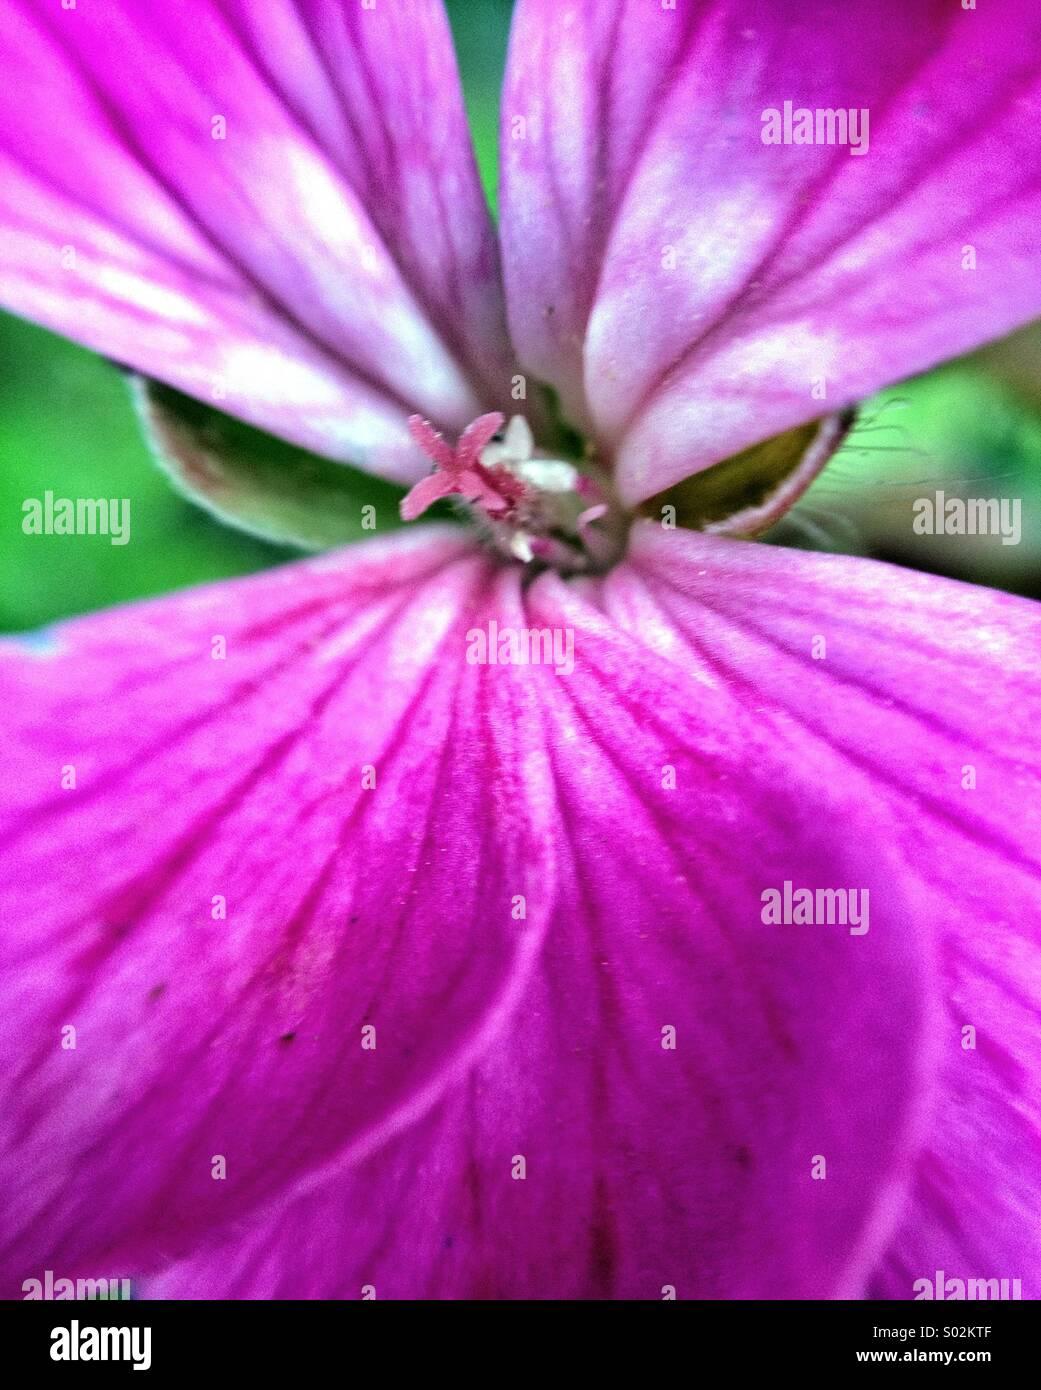 Geranium flower, macro - Stock Image